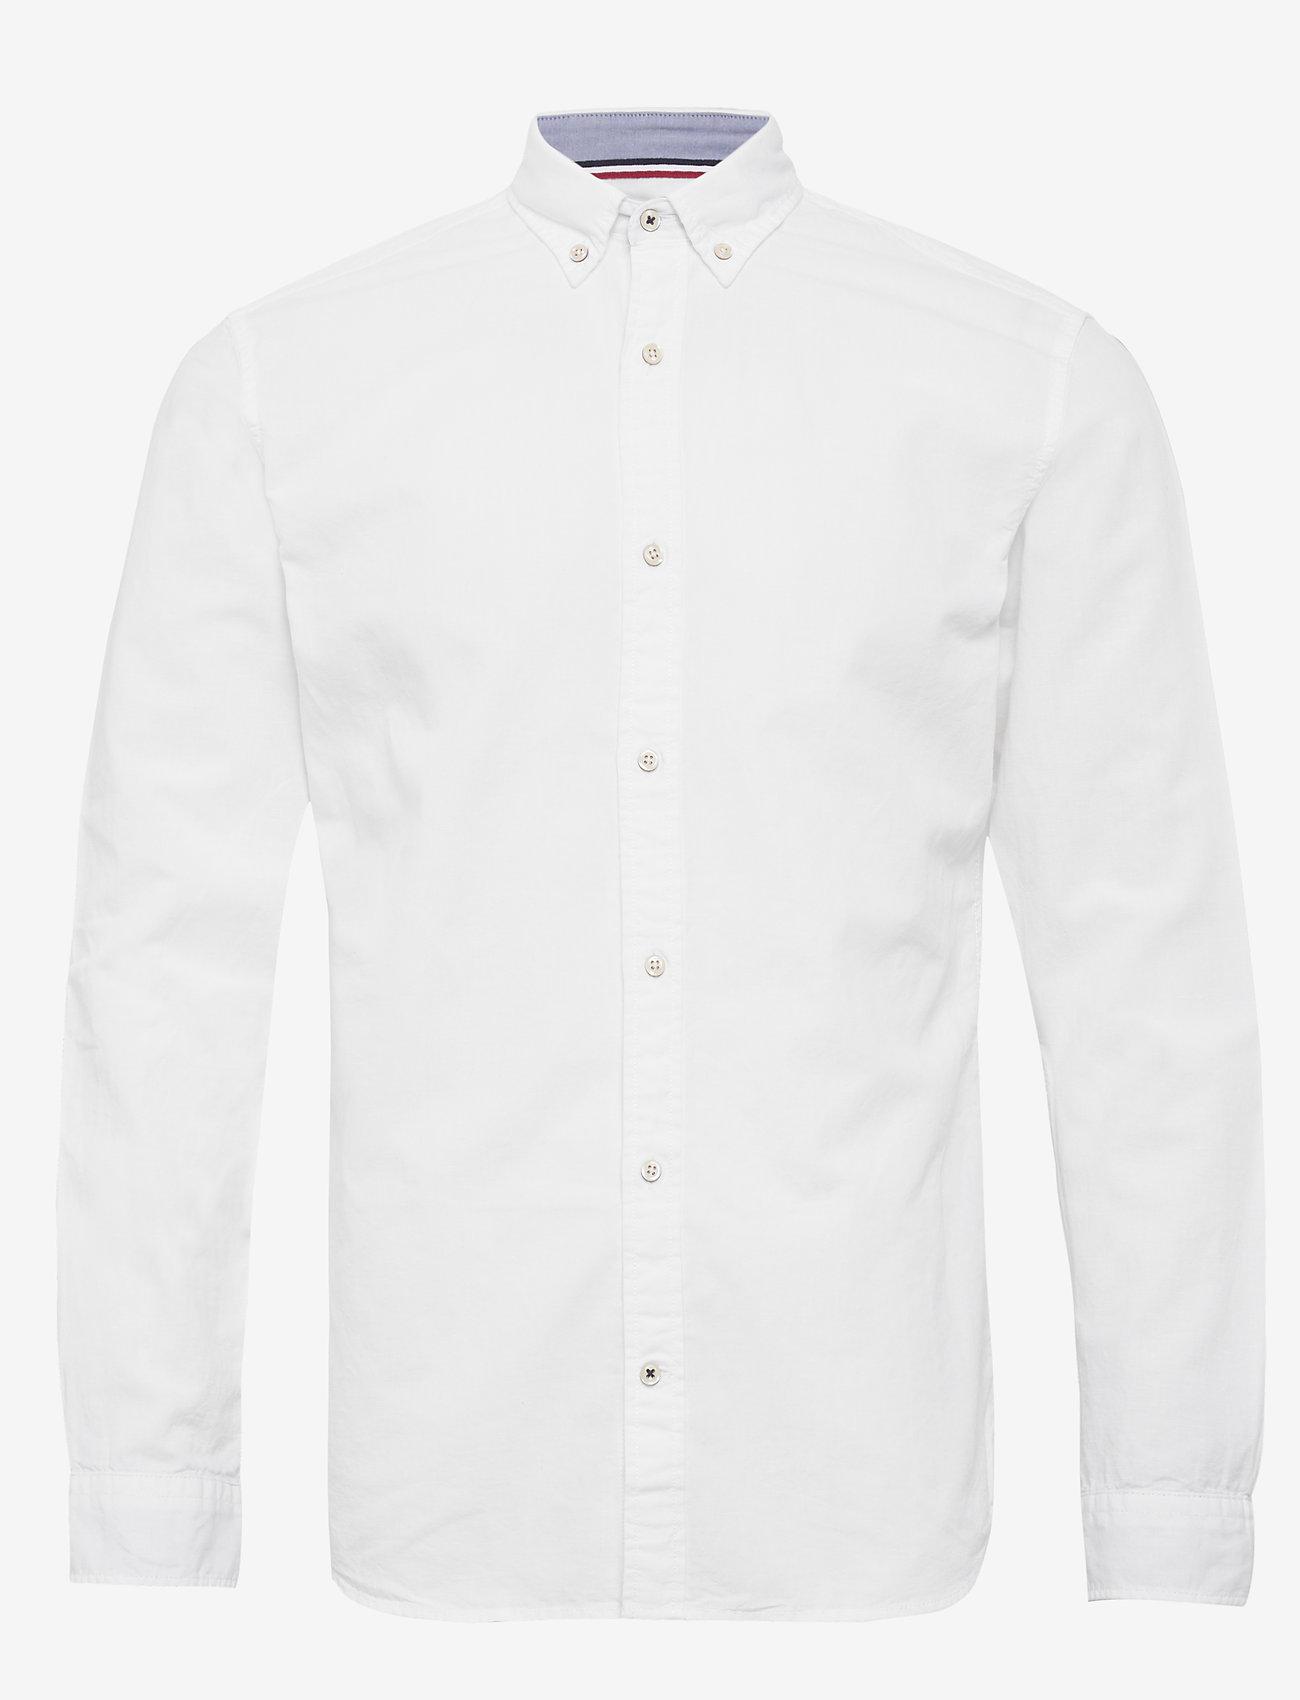 Jack & Jones - JJESUMMER SHIRT L/S S21 STS - basic skjortor - white - 0